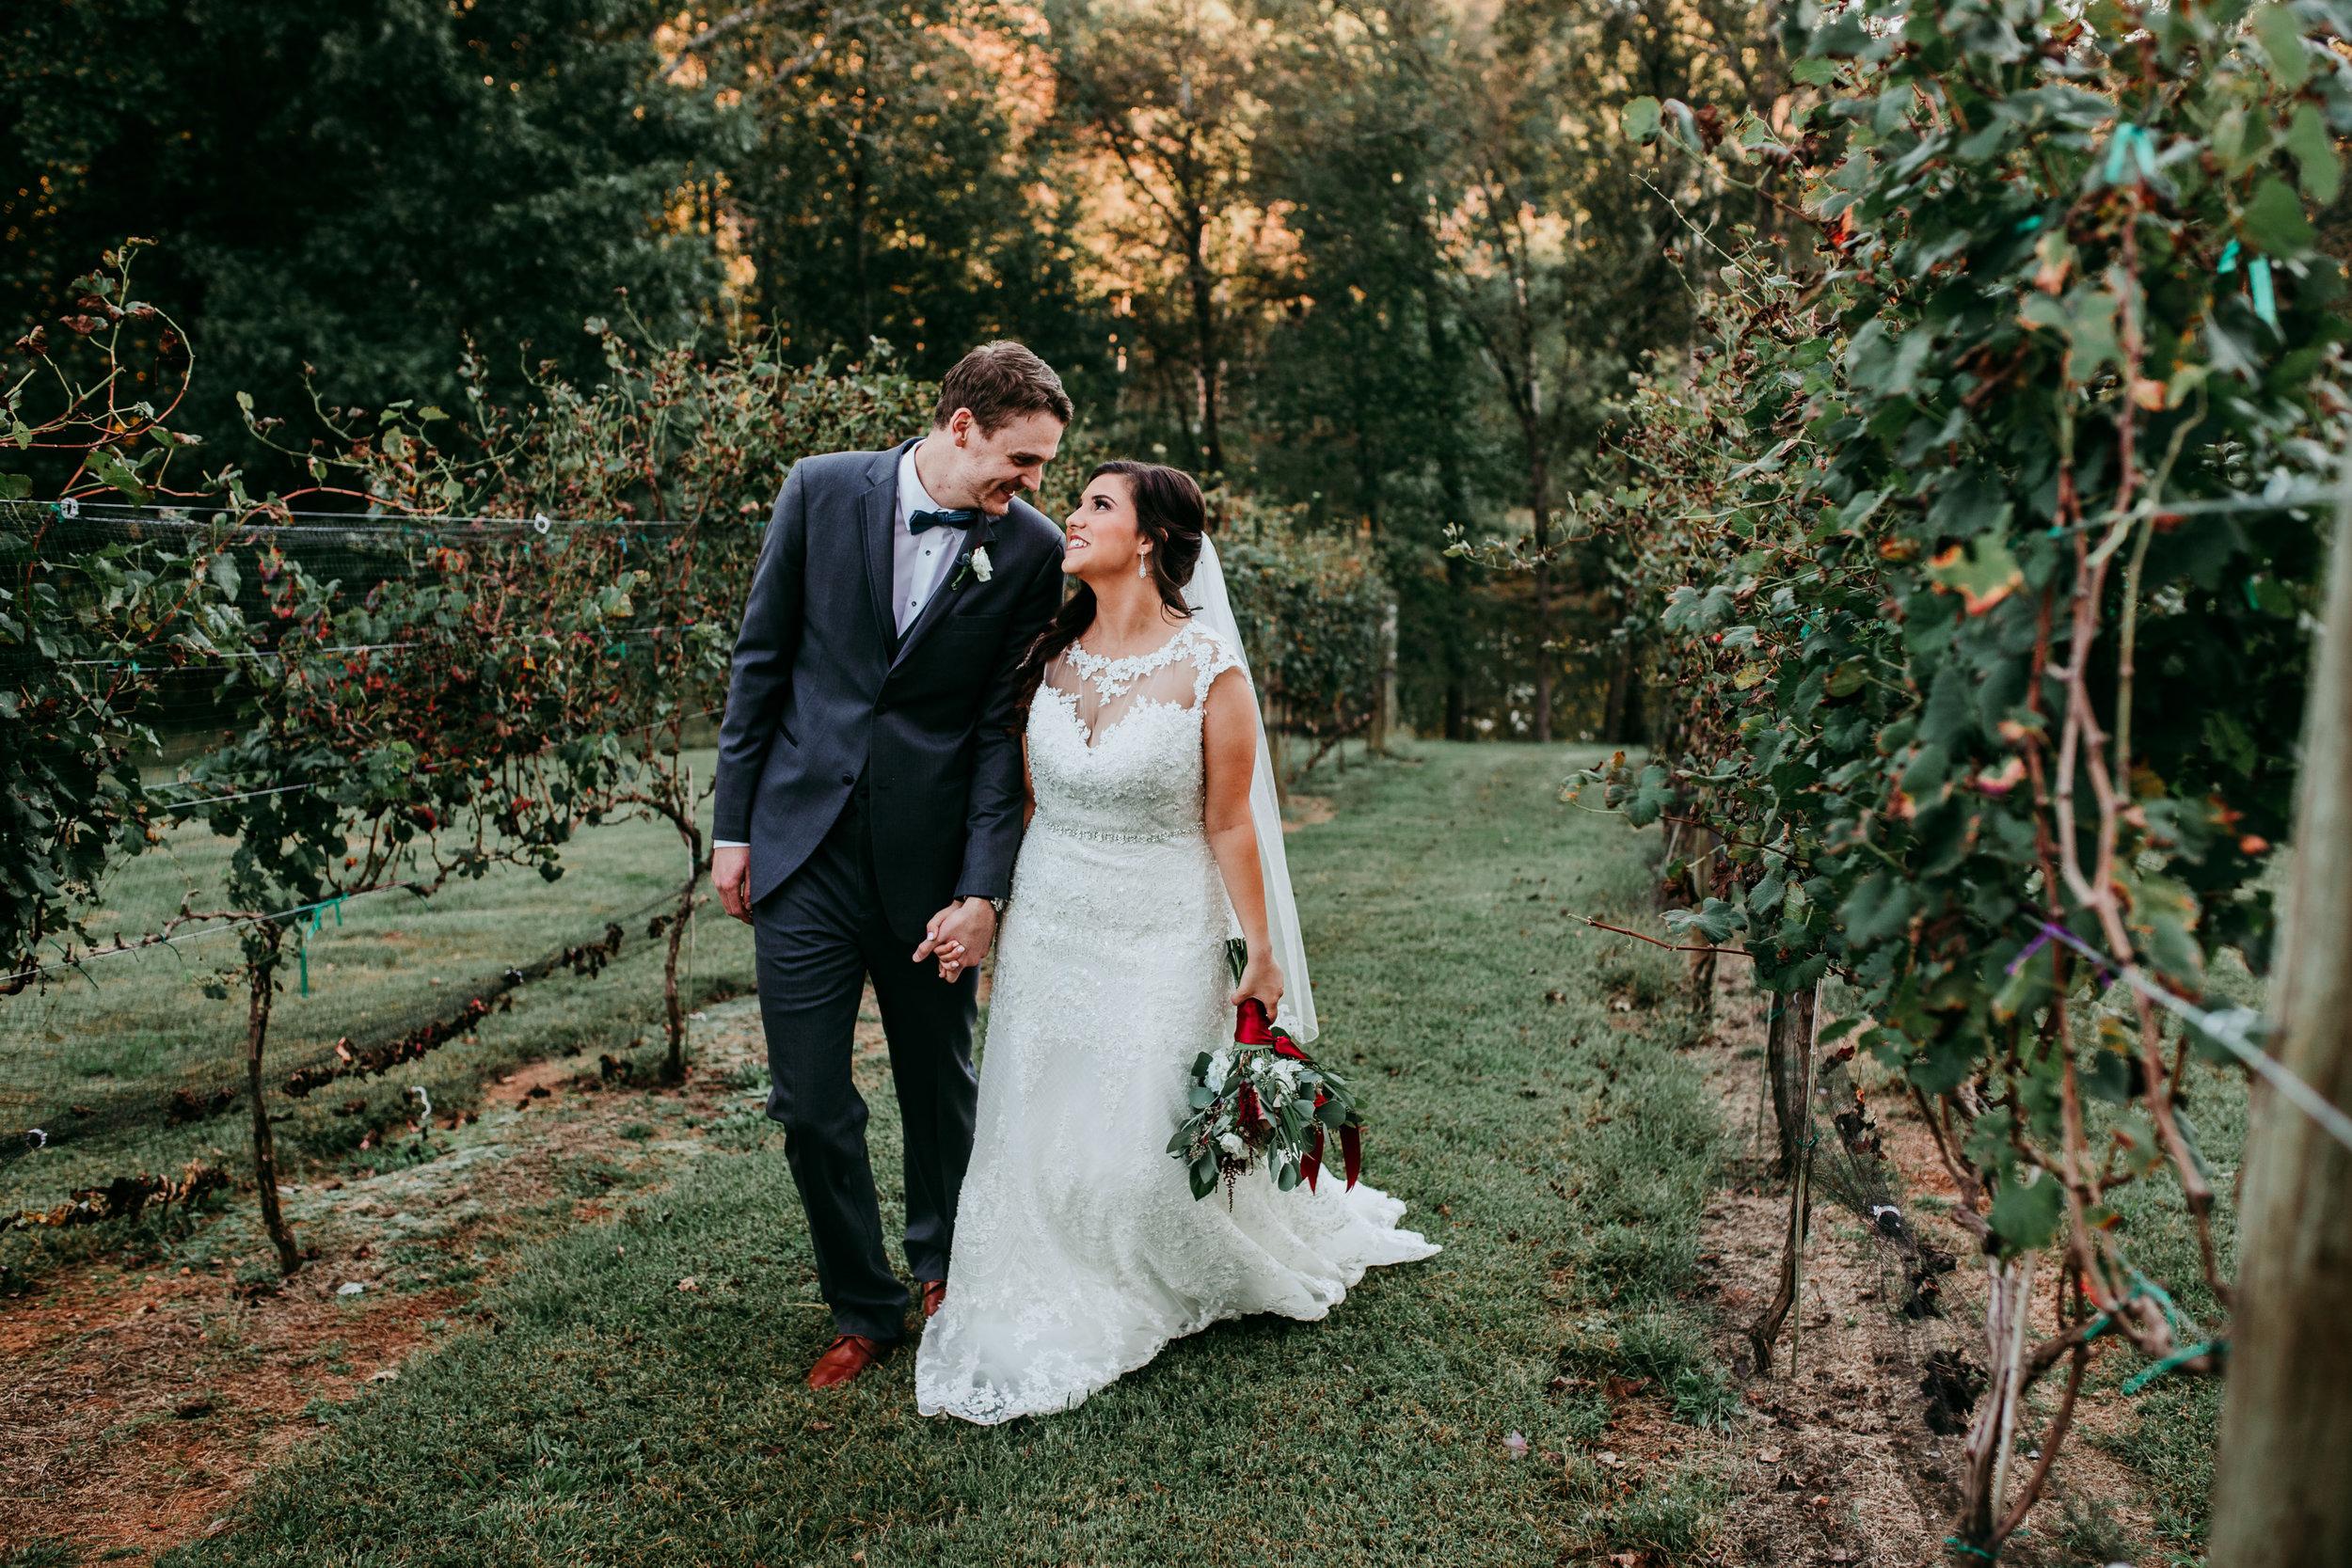 outdoor-fall-wedding-ceremony.jpg